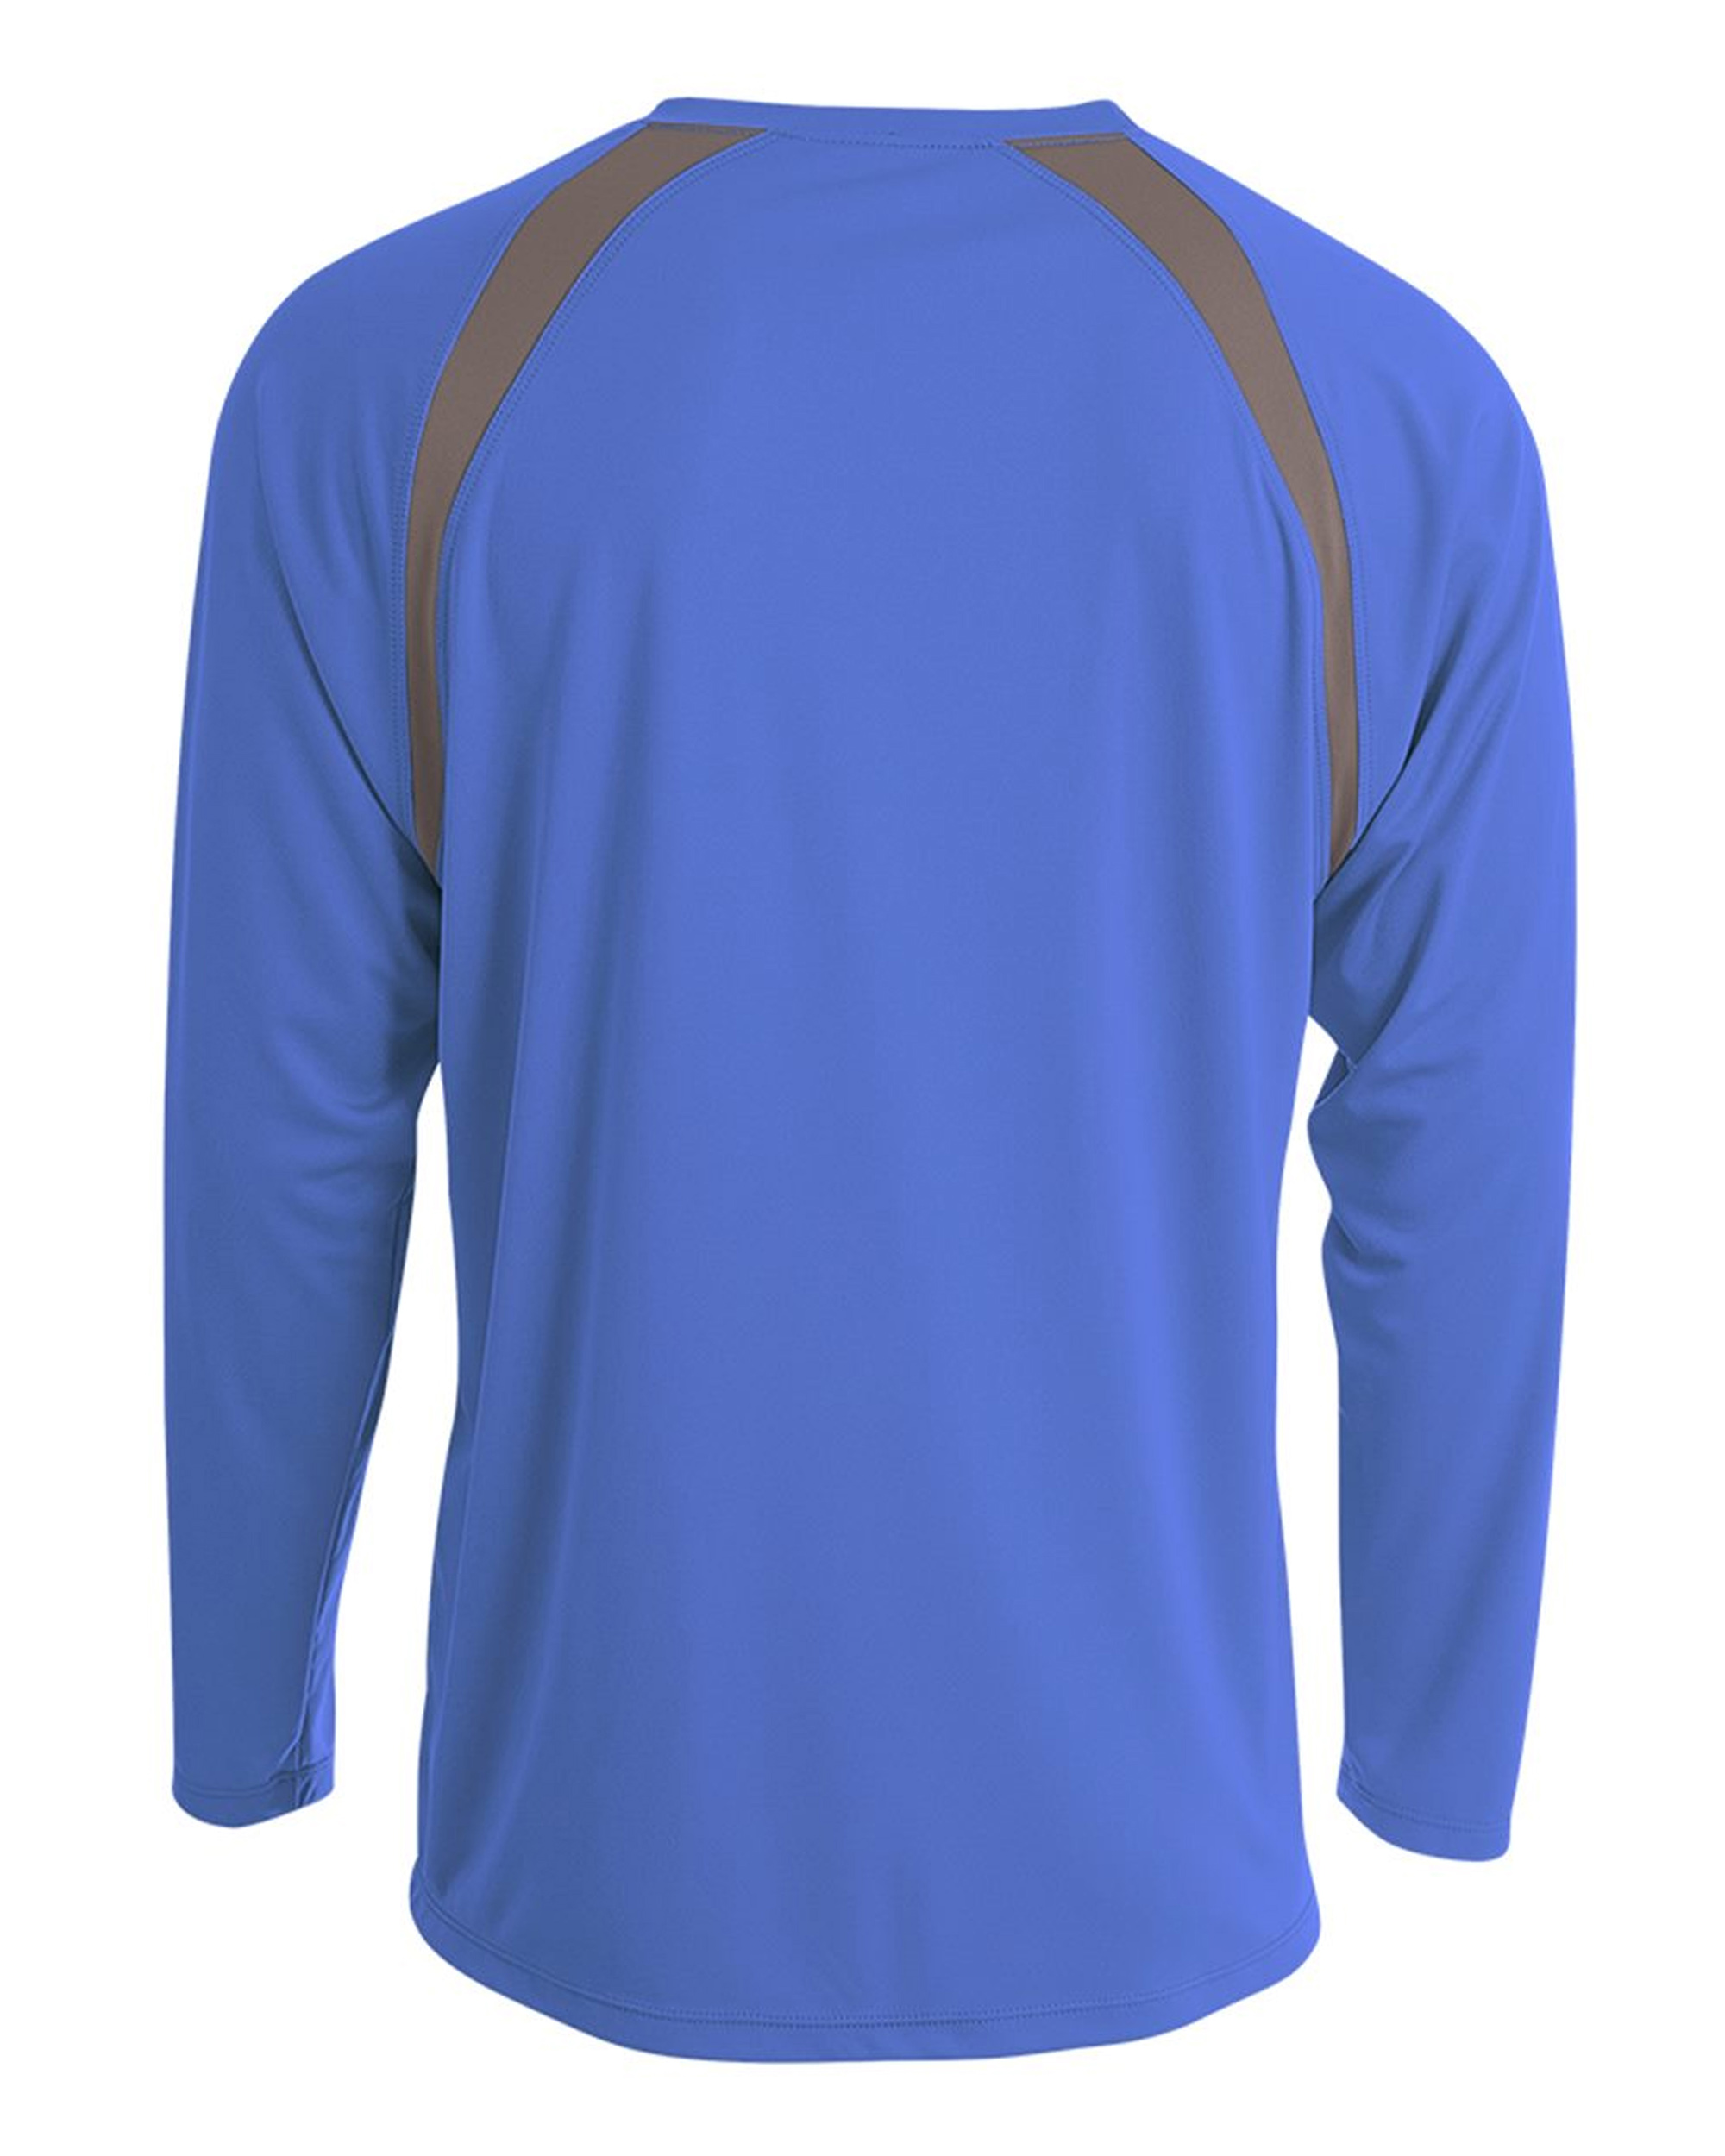 Men-039-s-Long-Sleeve-Loose-Fit-Rash-Guard-Surf-Shirt-Water-Sports-Swimwear thumbnail 18